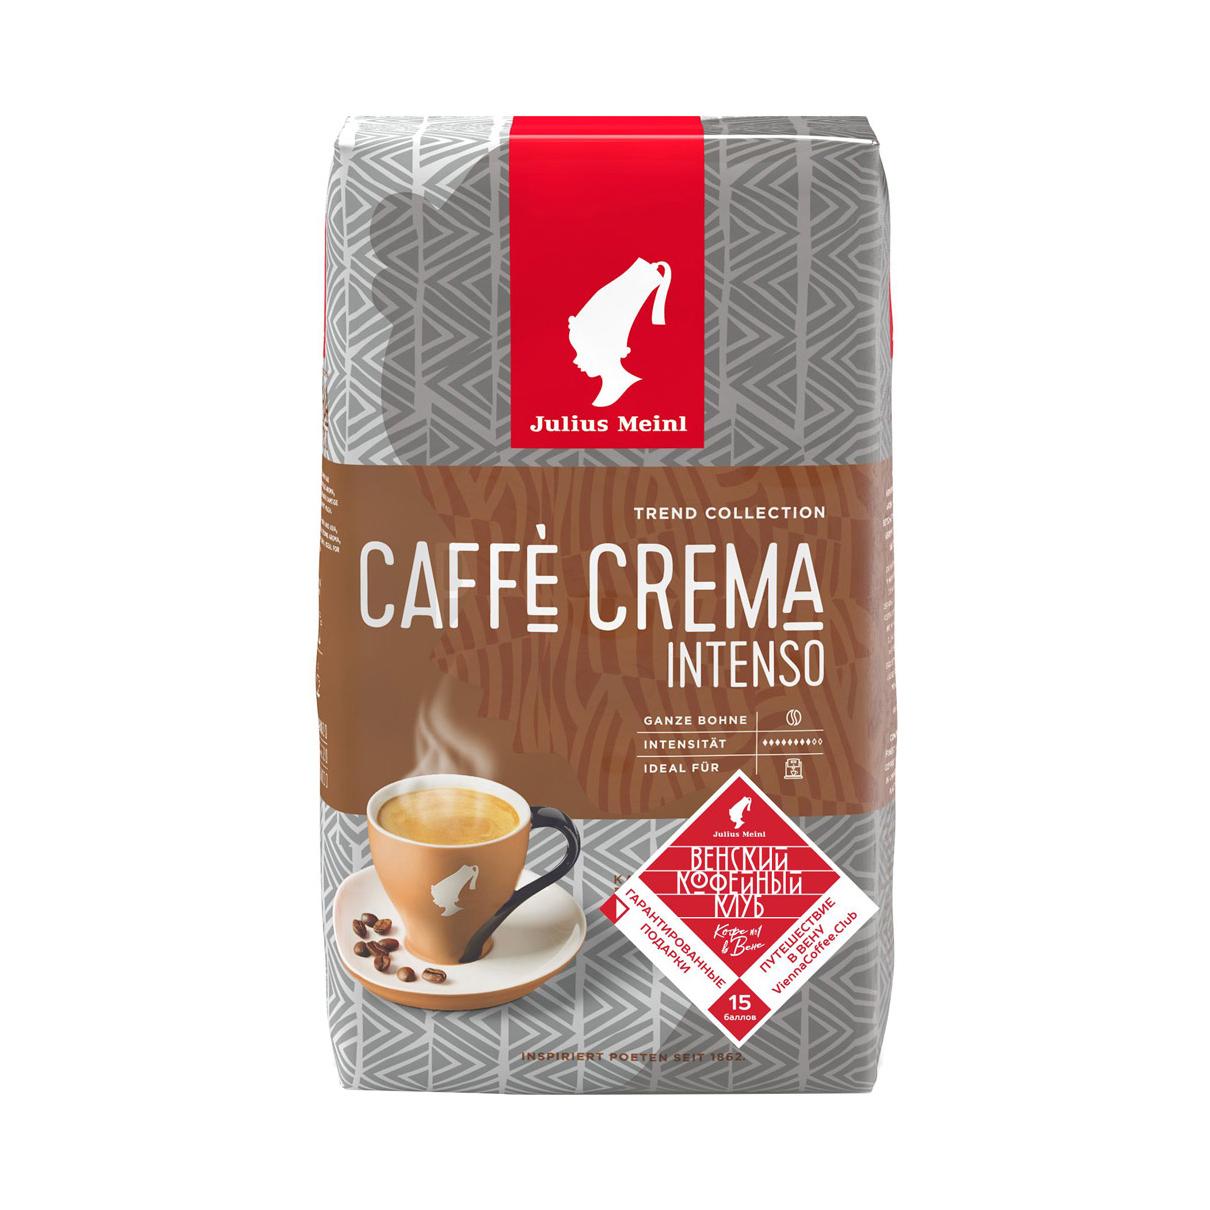 Кофе зерновой Julius Meinl Trend Collection Caffe Crema Intenso 1 кг meinl hthh1bk